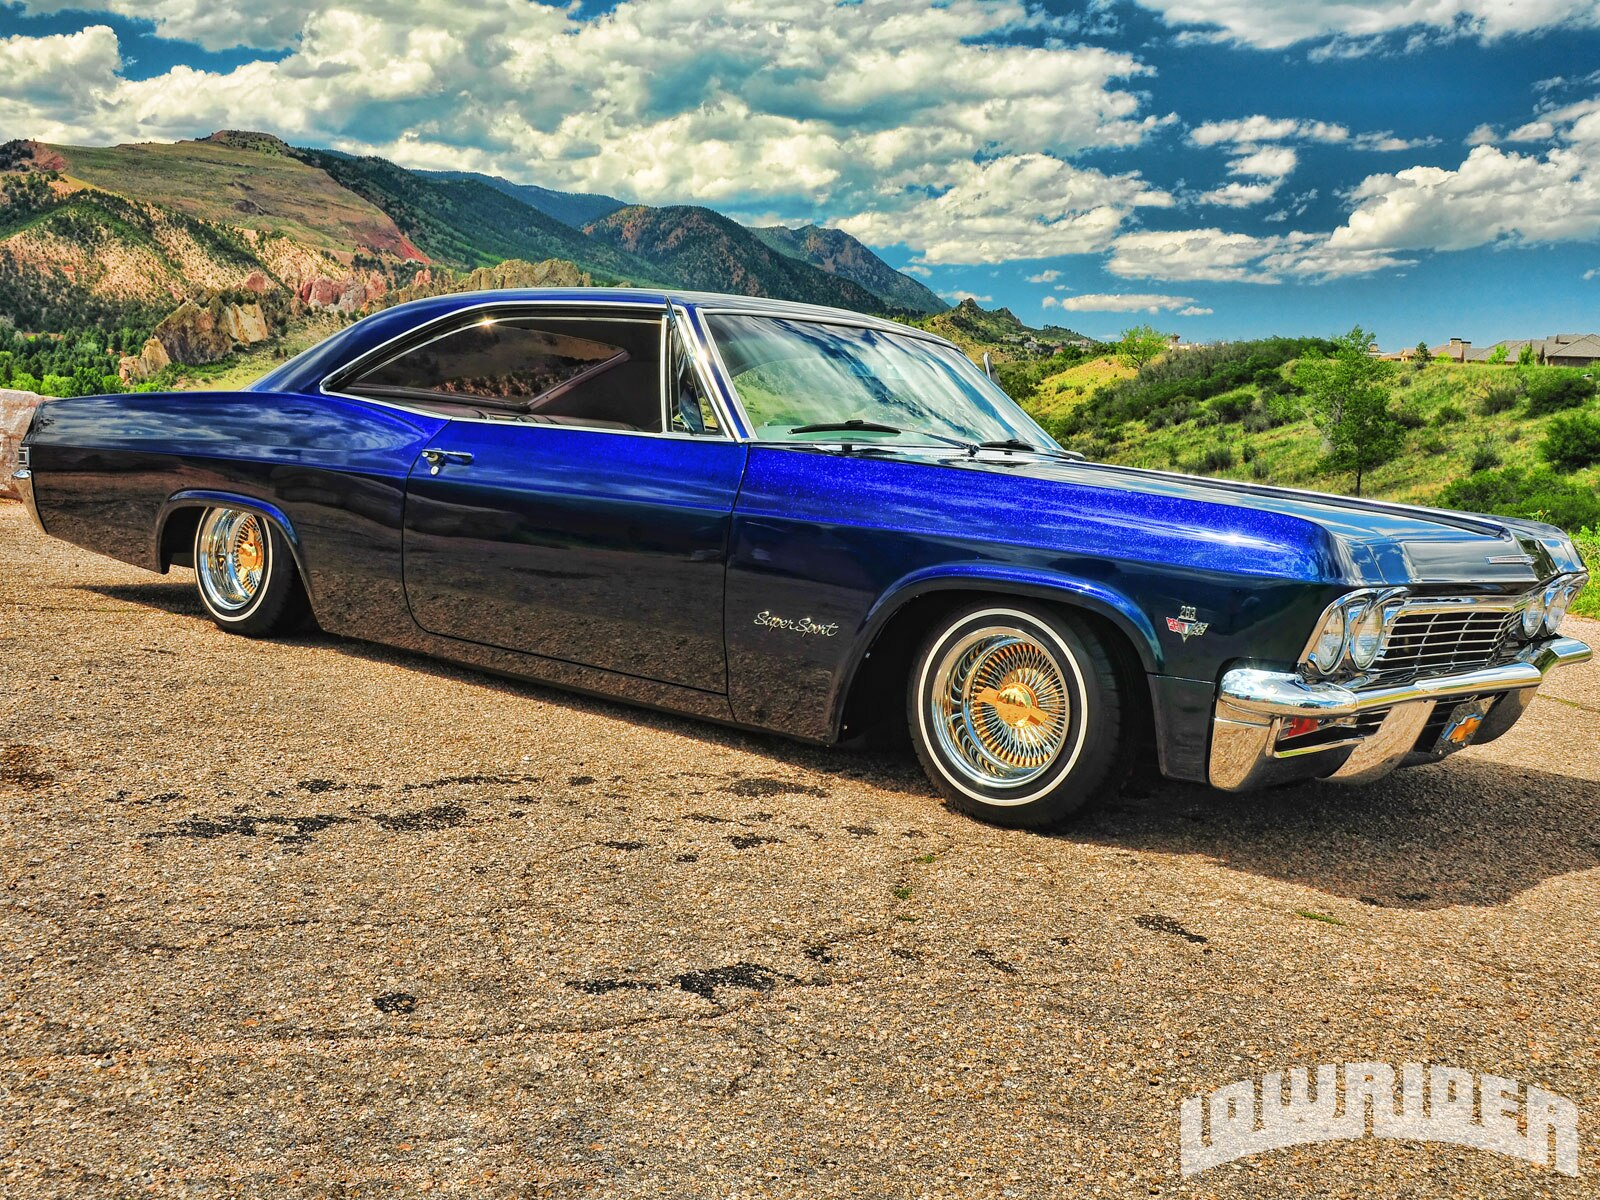 1301-lrmp-01-o-1965-chevrolet-impala-SS-passenger-side-view1